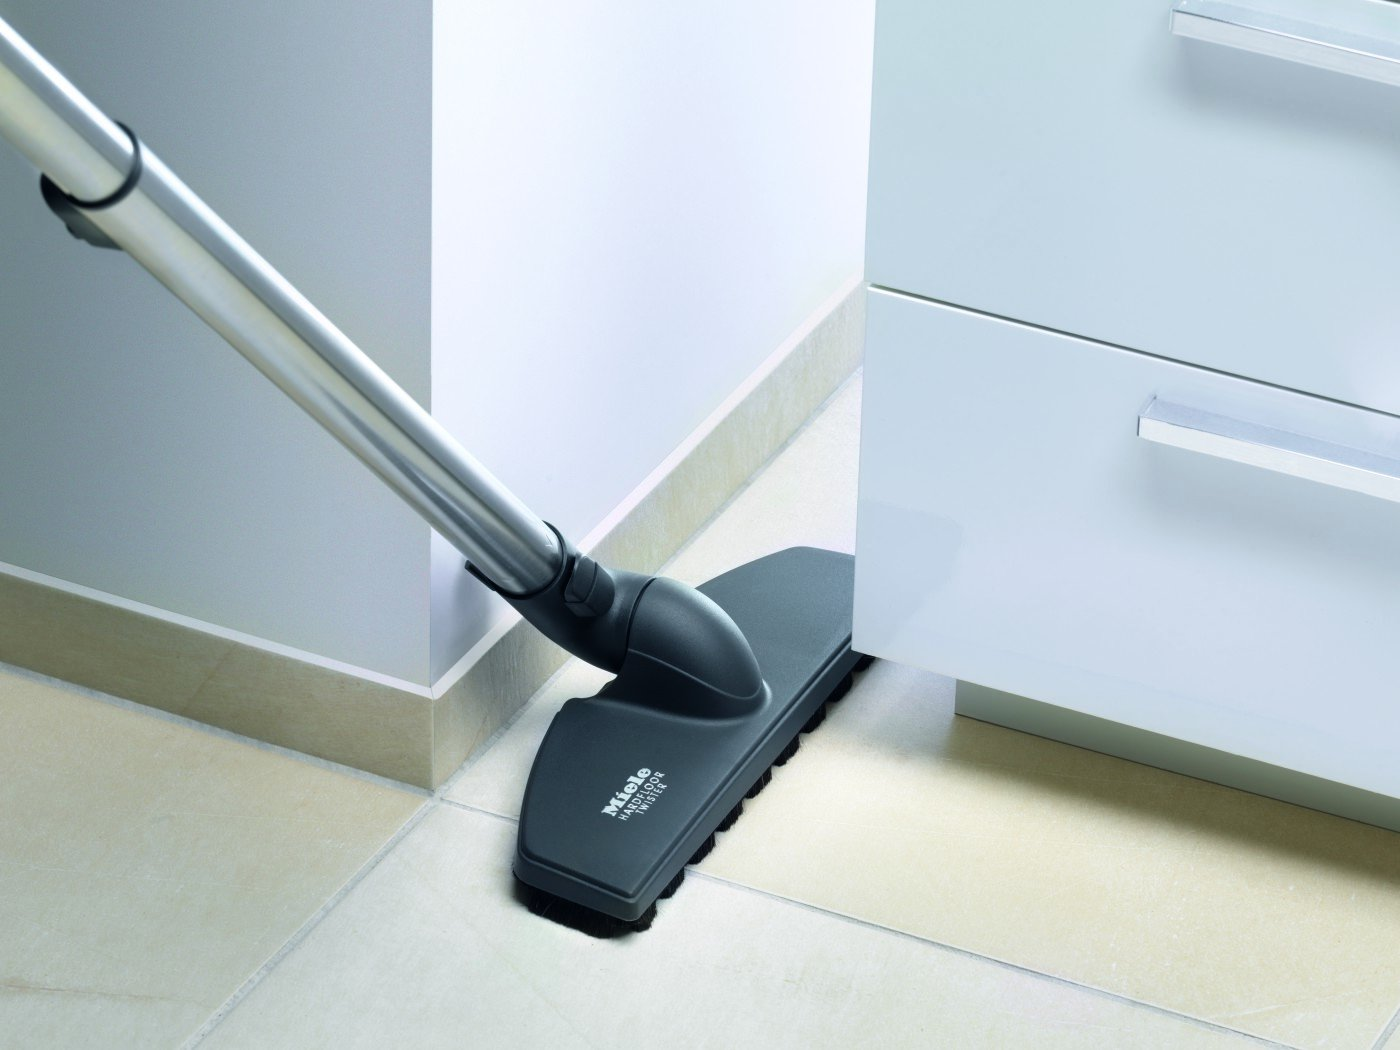 Plastic Black Miele Parquet Twister Hard Floor Tool Nozzle